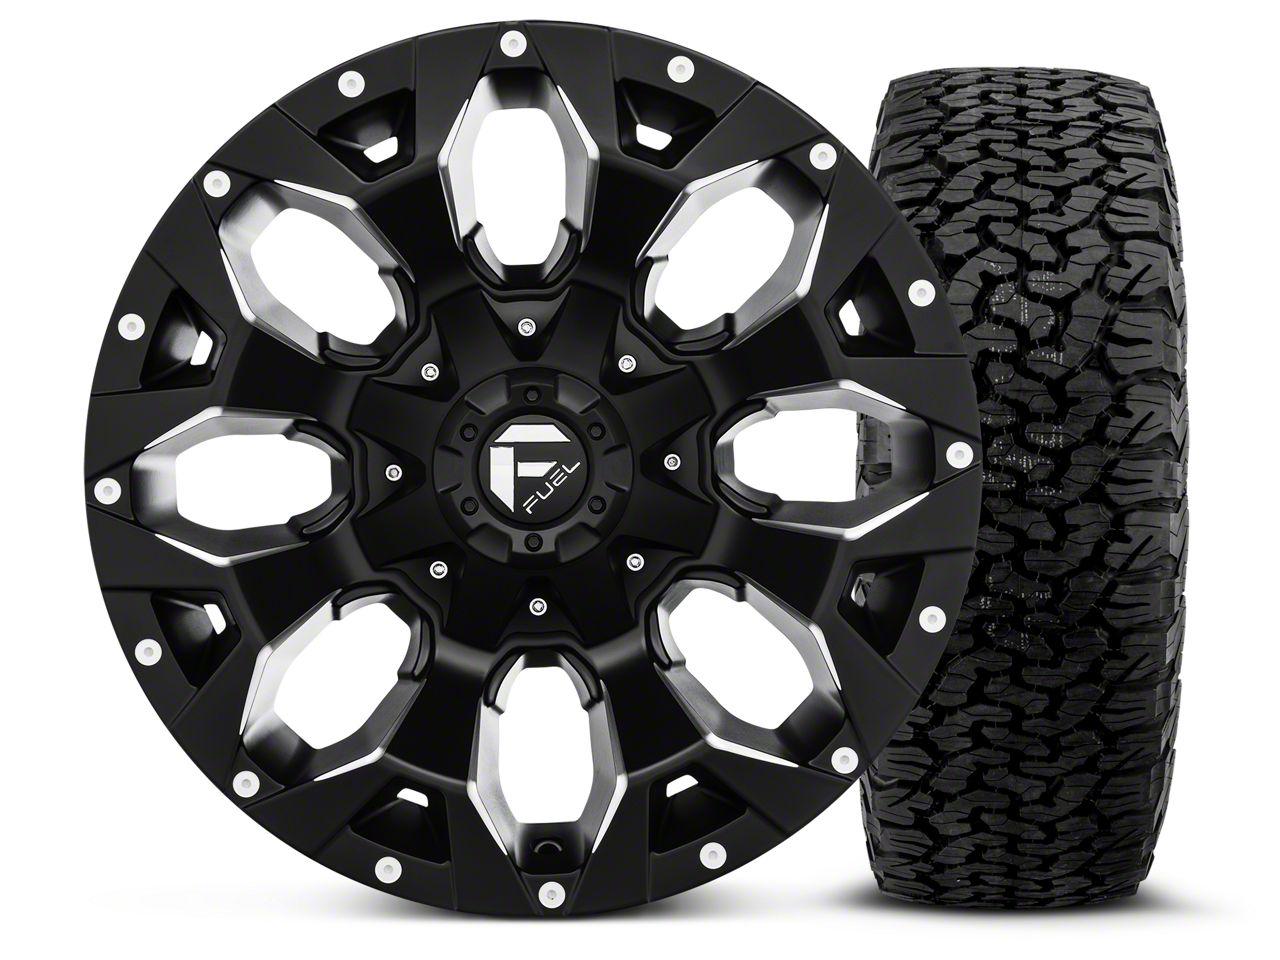 Fuel Wheels Assault Black Machined - 17x9 Wheel - and BF Goodrich All Terrain TA KO2 Tire - 315/70R17 (07-18 Jeep Wrangler JK)